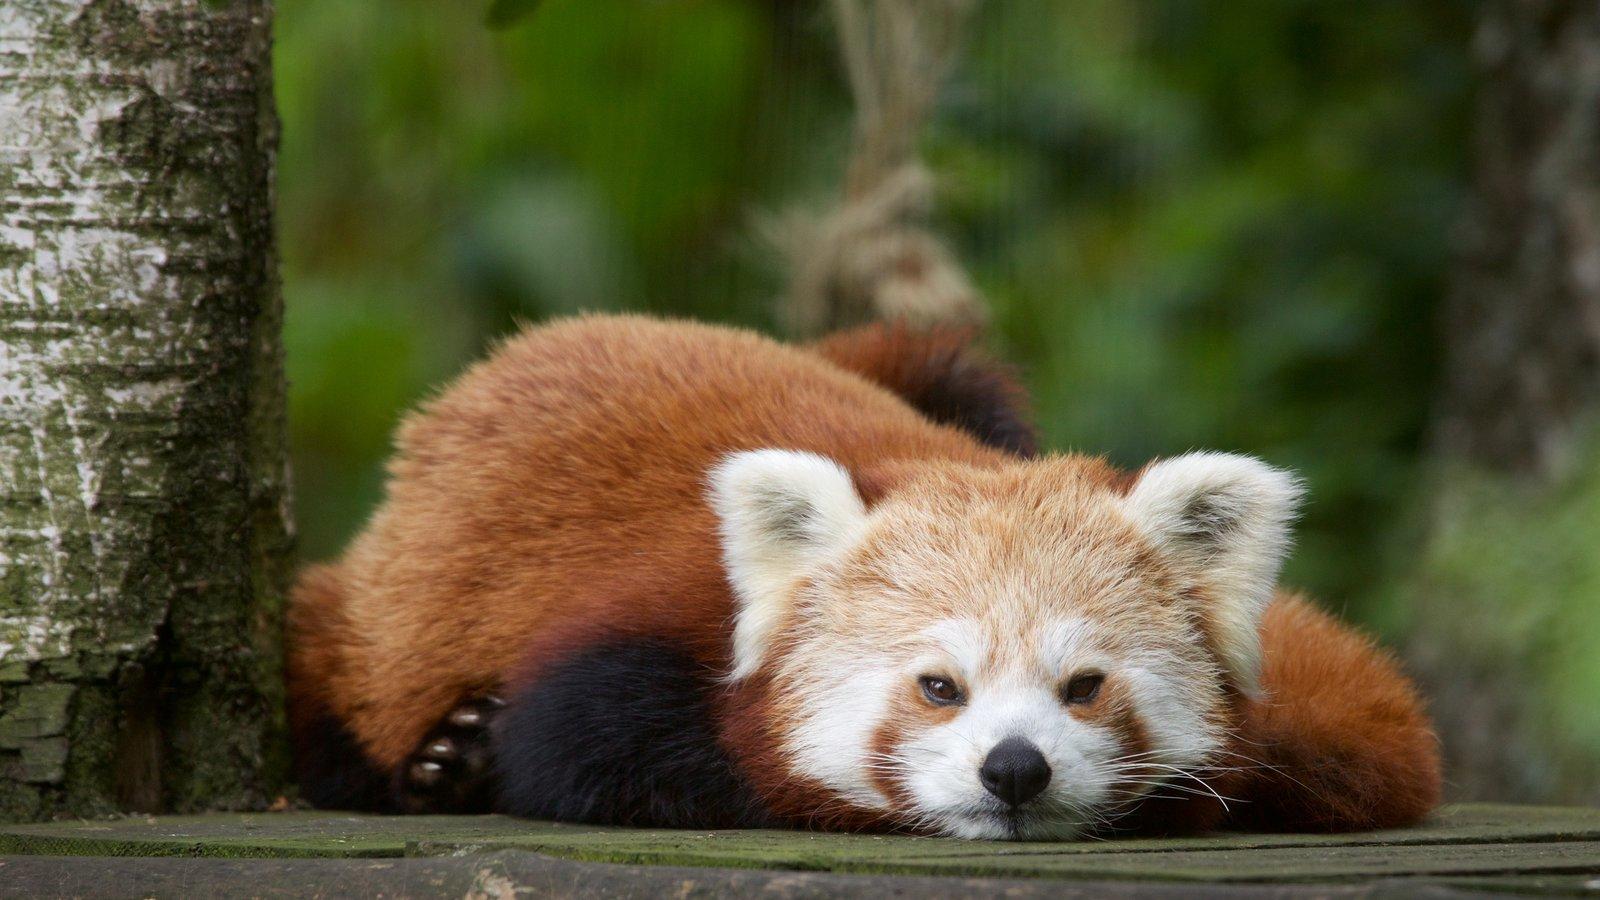 Highland Wildlife Park which includes cuddly or friendly animals